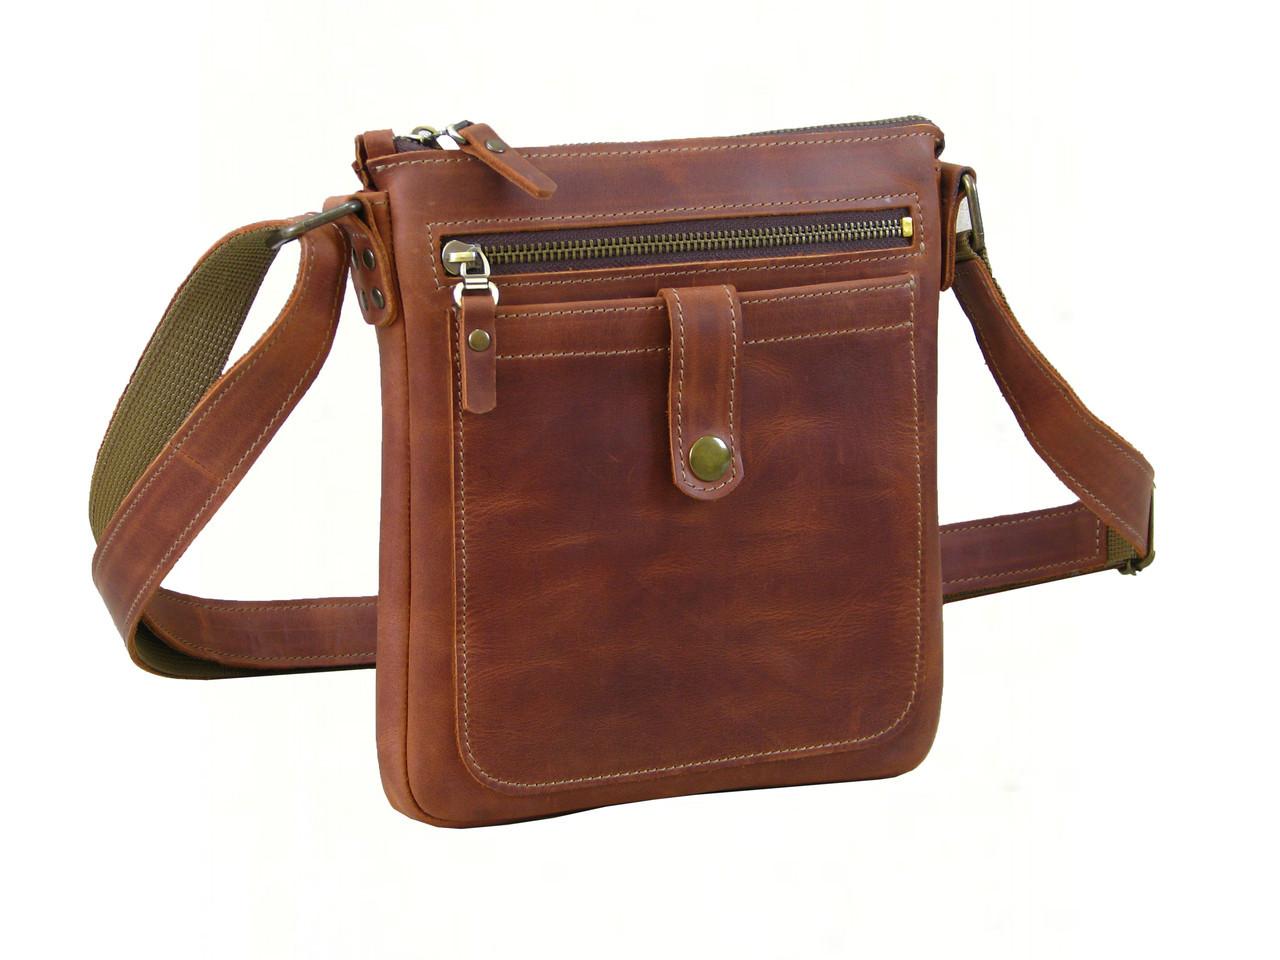 Кожаная сумка - планшет GS мужская коньячная рыжая